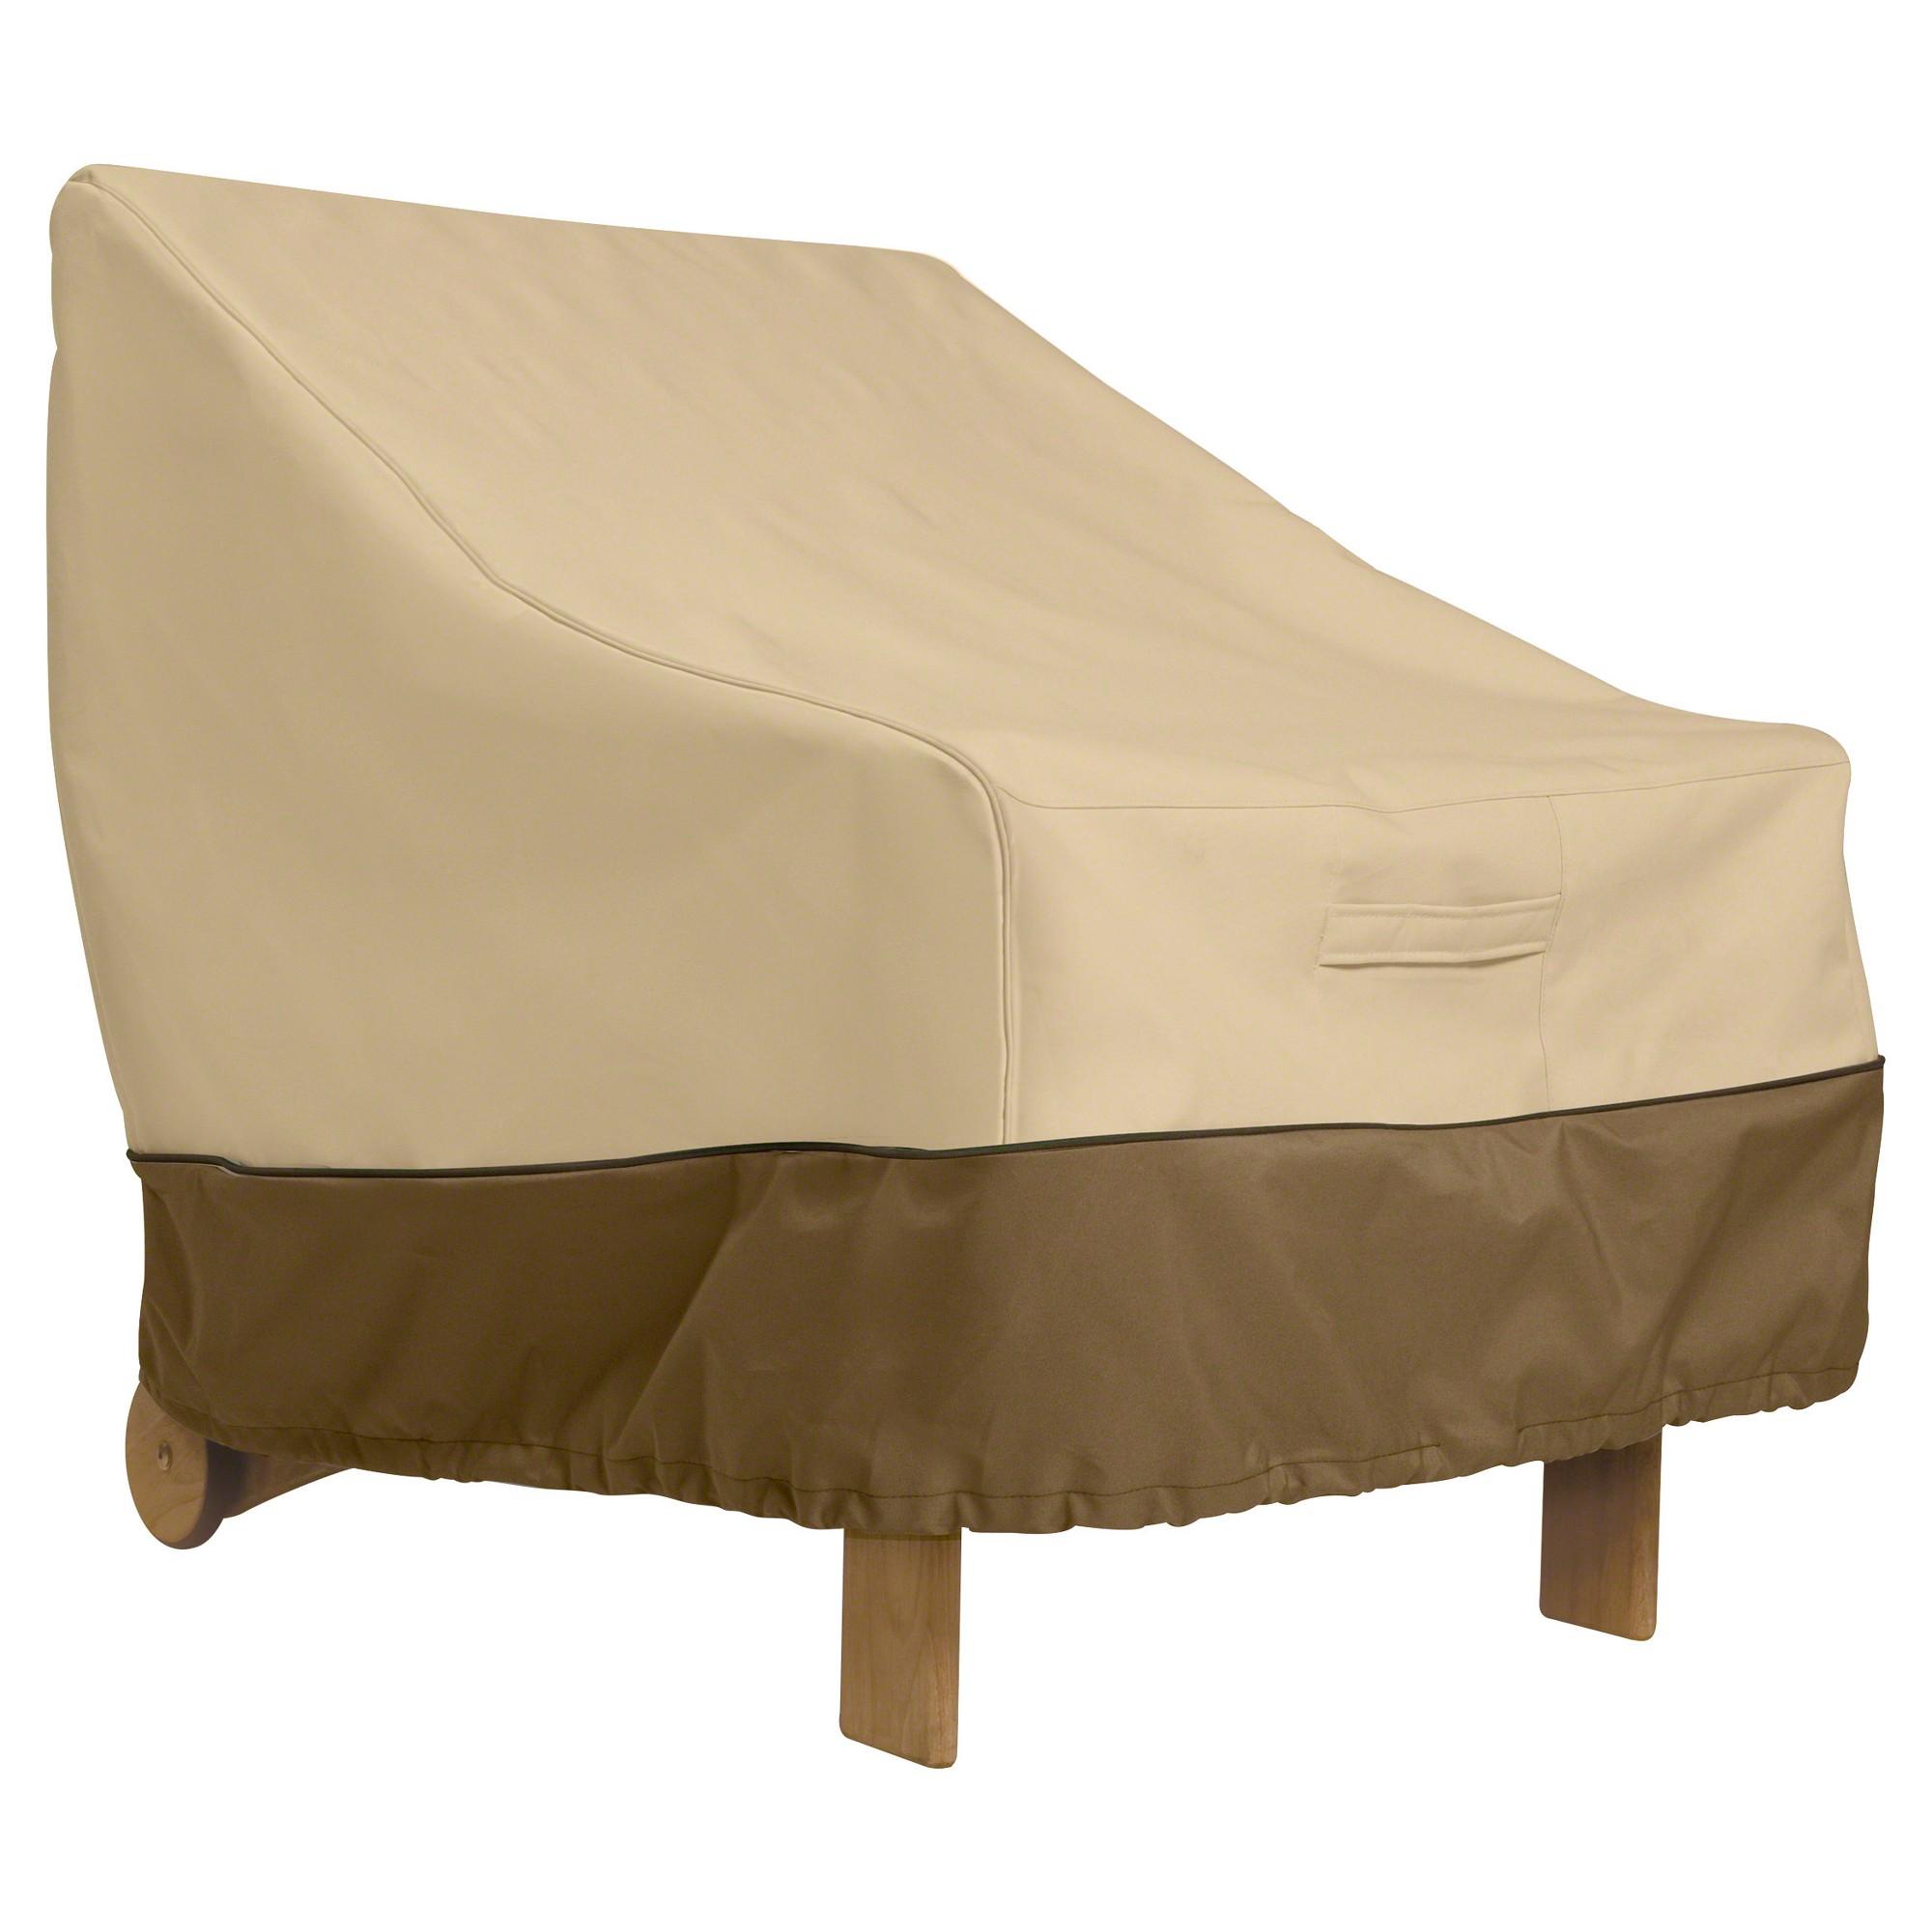 Veranda Deep Patio Lounge Chair Cover Light Pebble